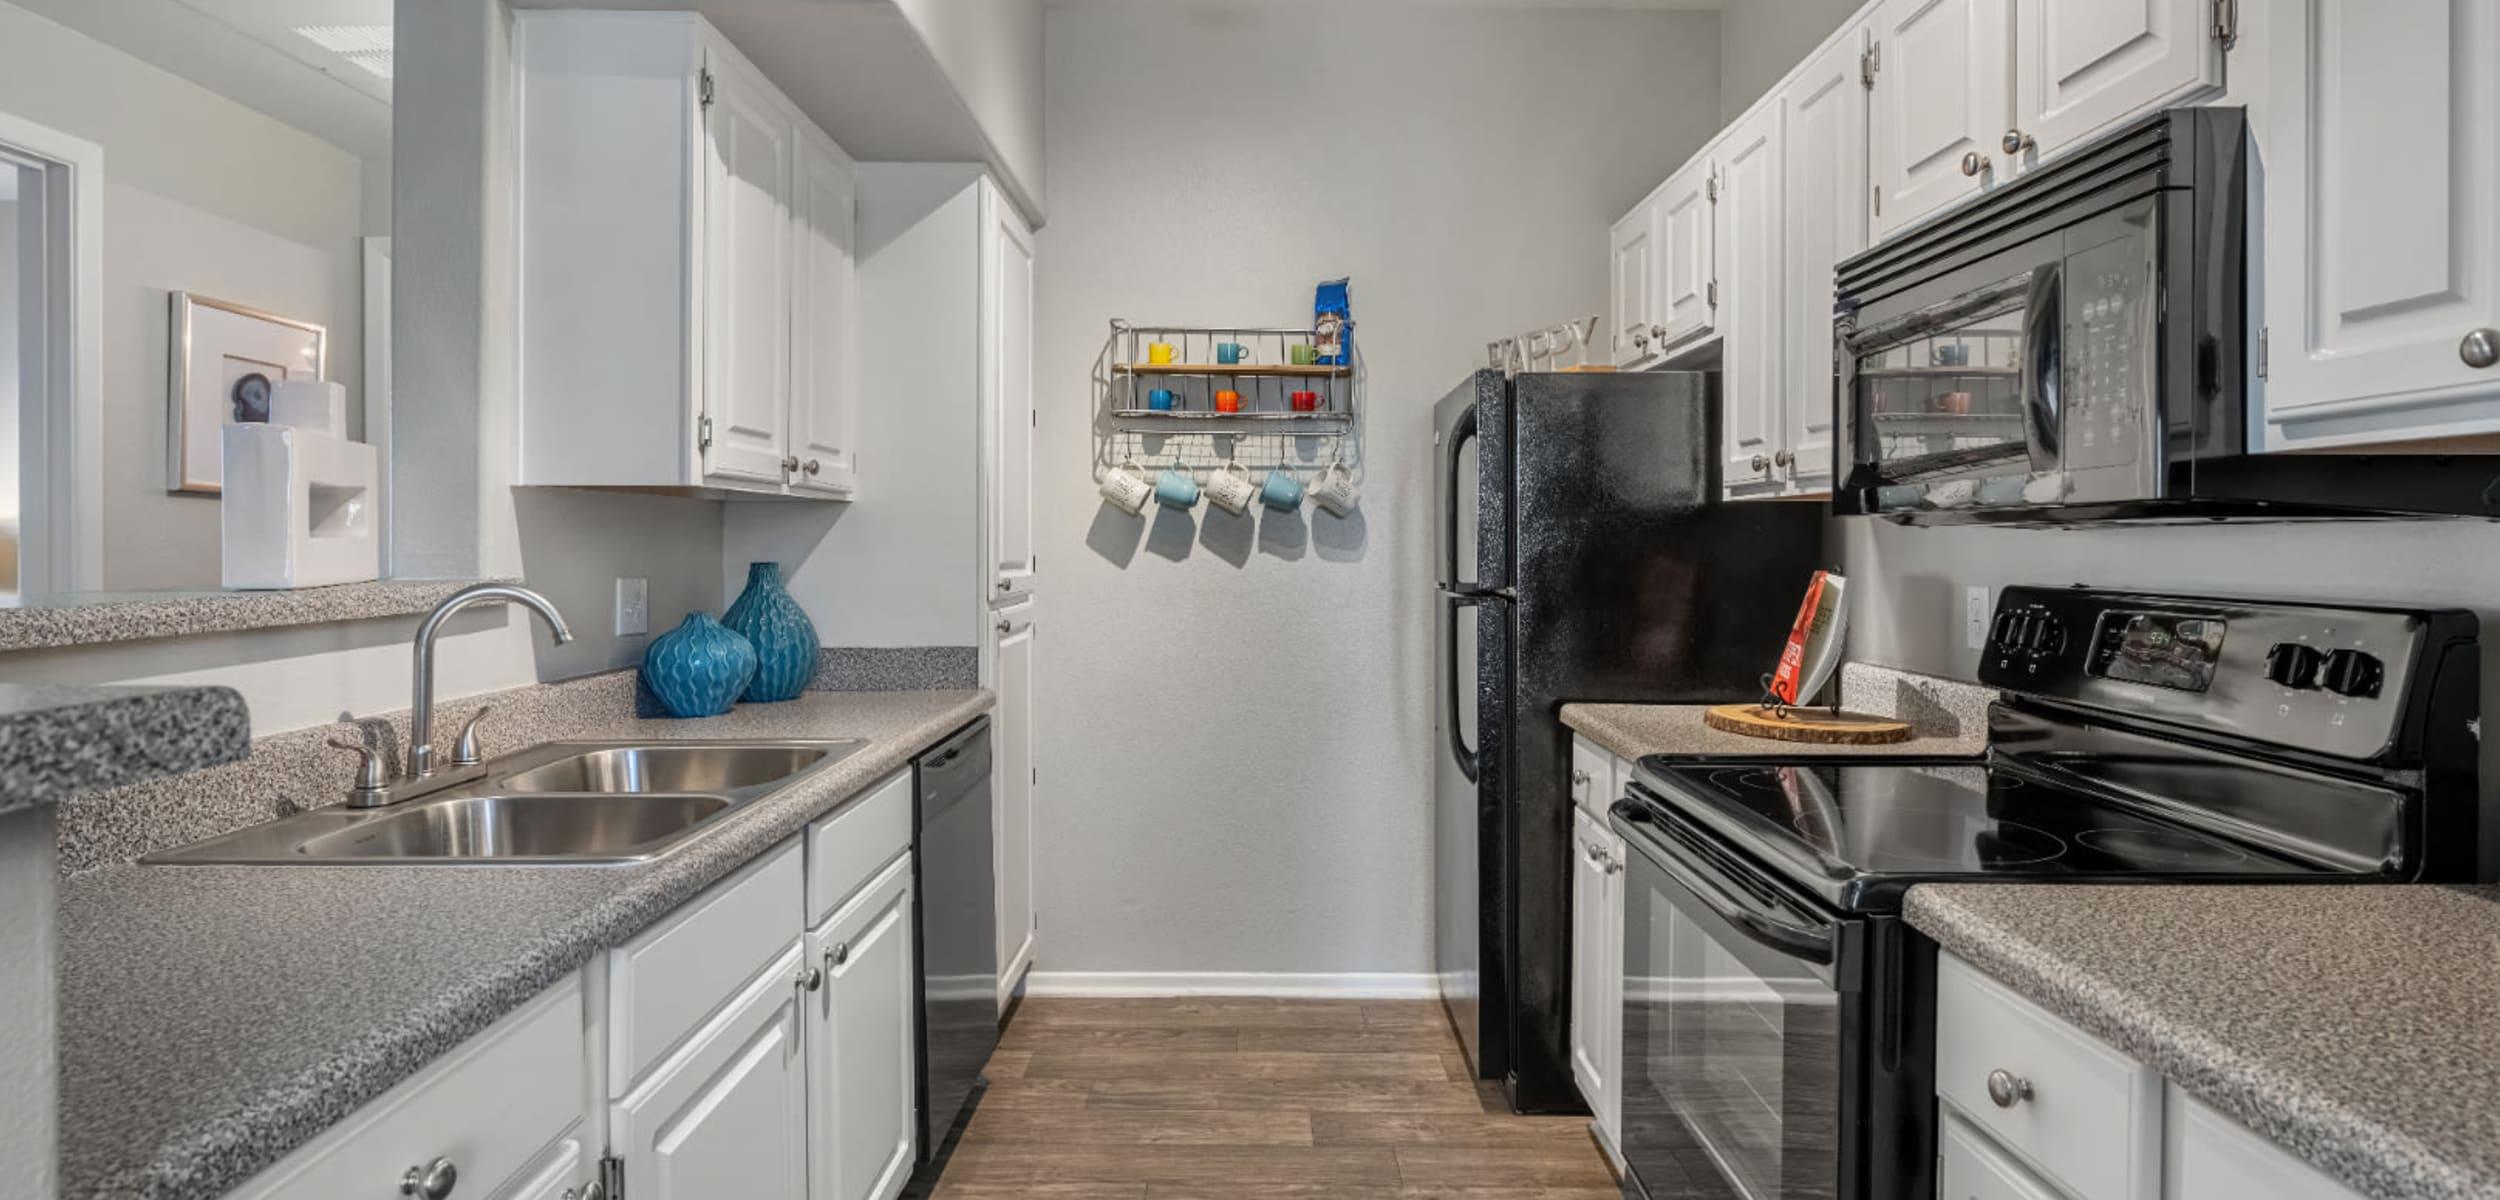 Modern, sleek kitchen with modern appliances at Alante at the Islands in Chandler, Arizona